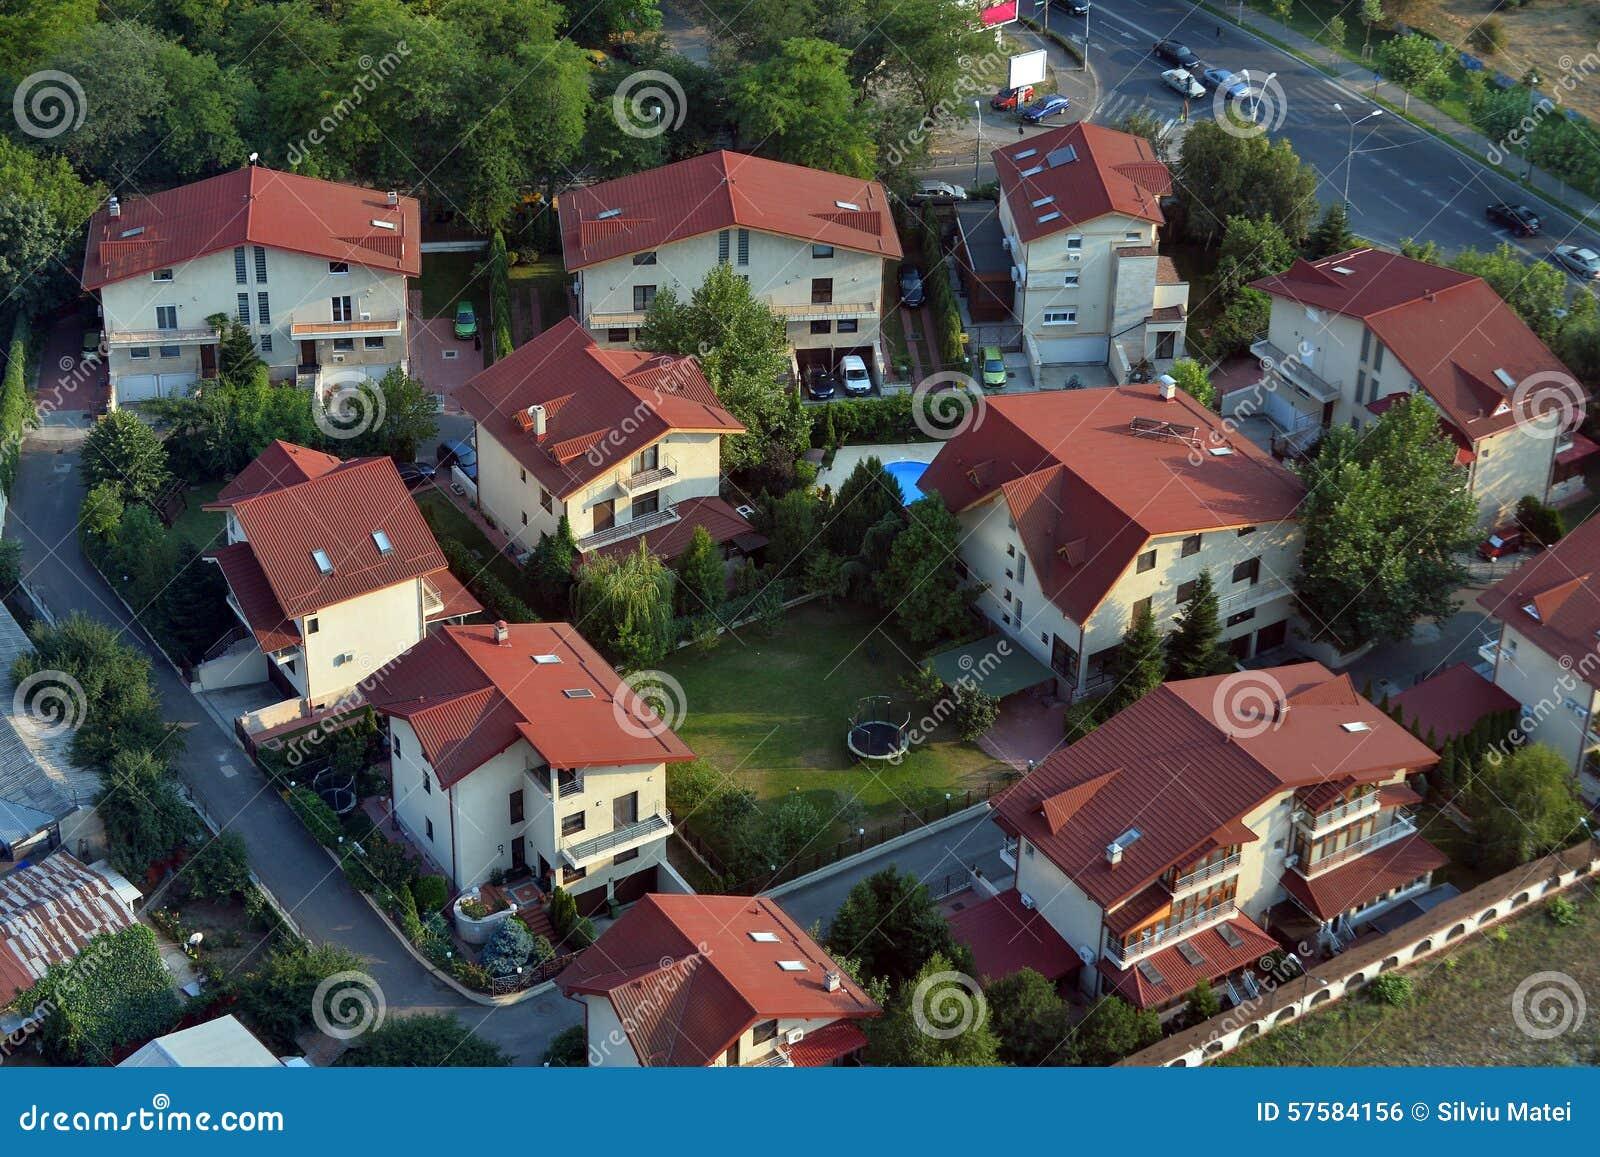 Modern neighborhood with modern houses